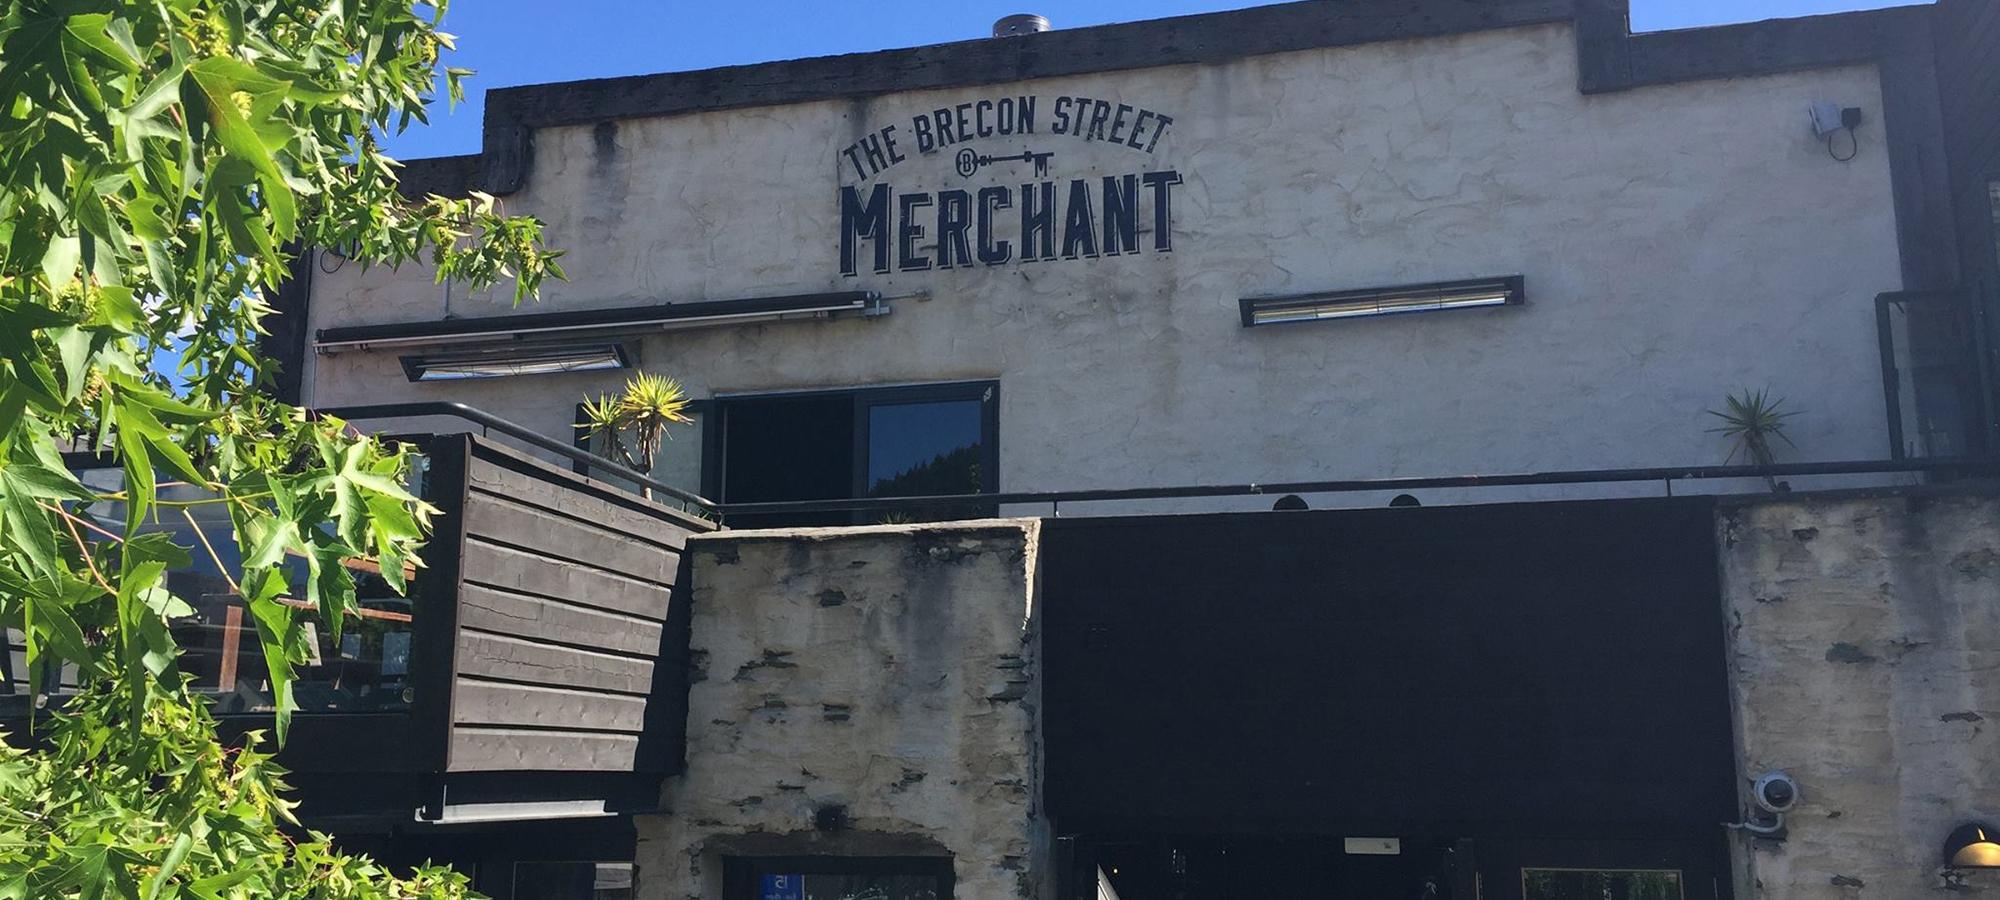 Merchant Building Exterior